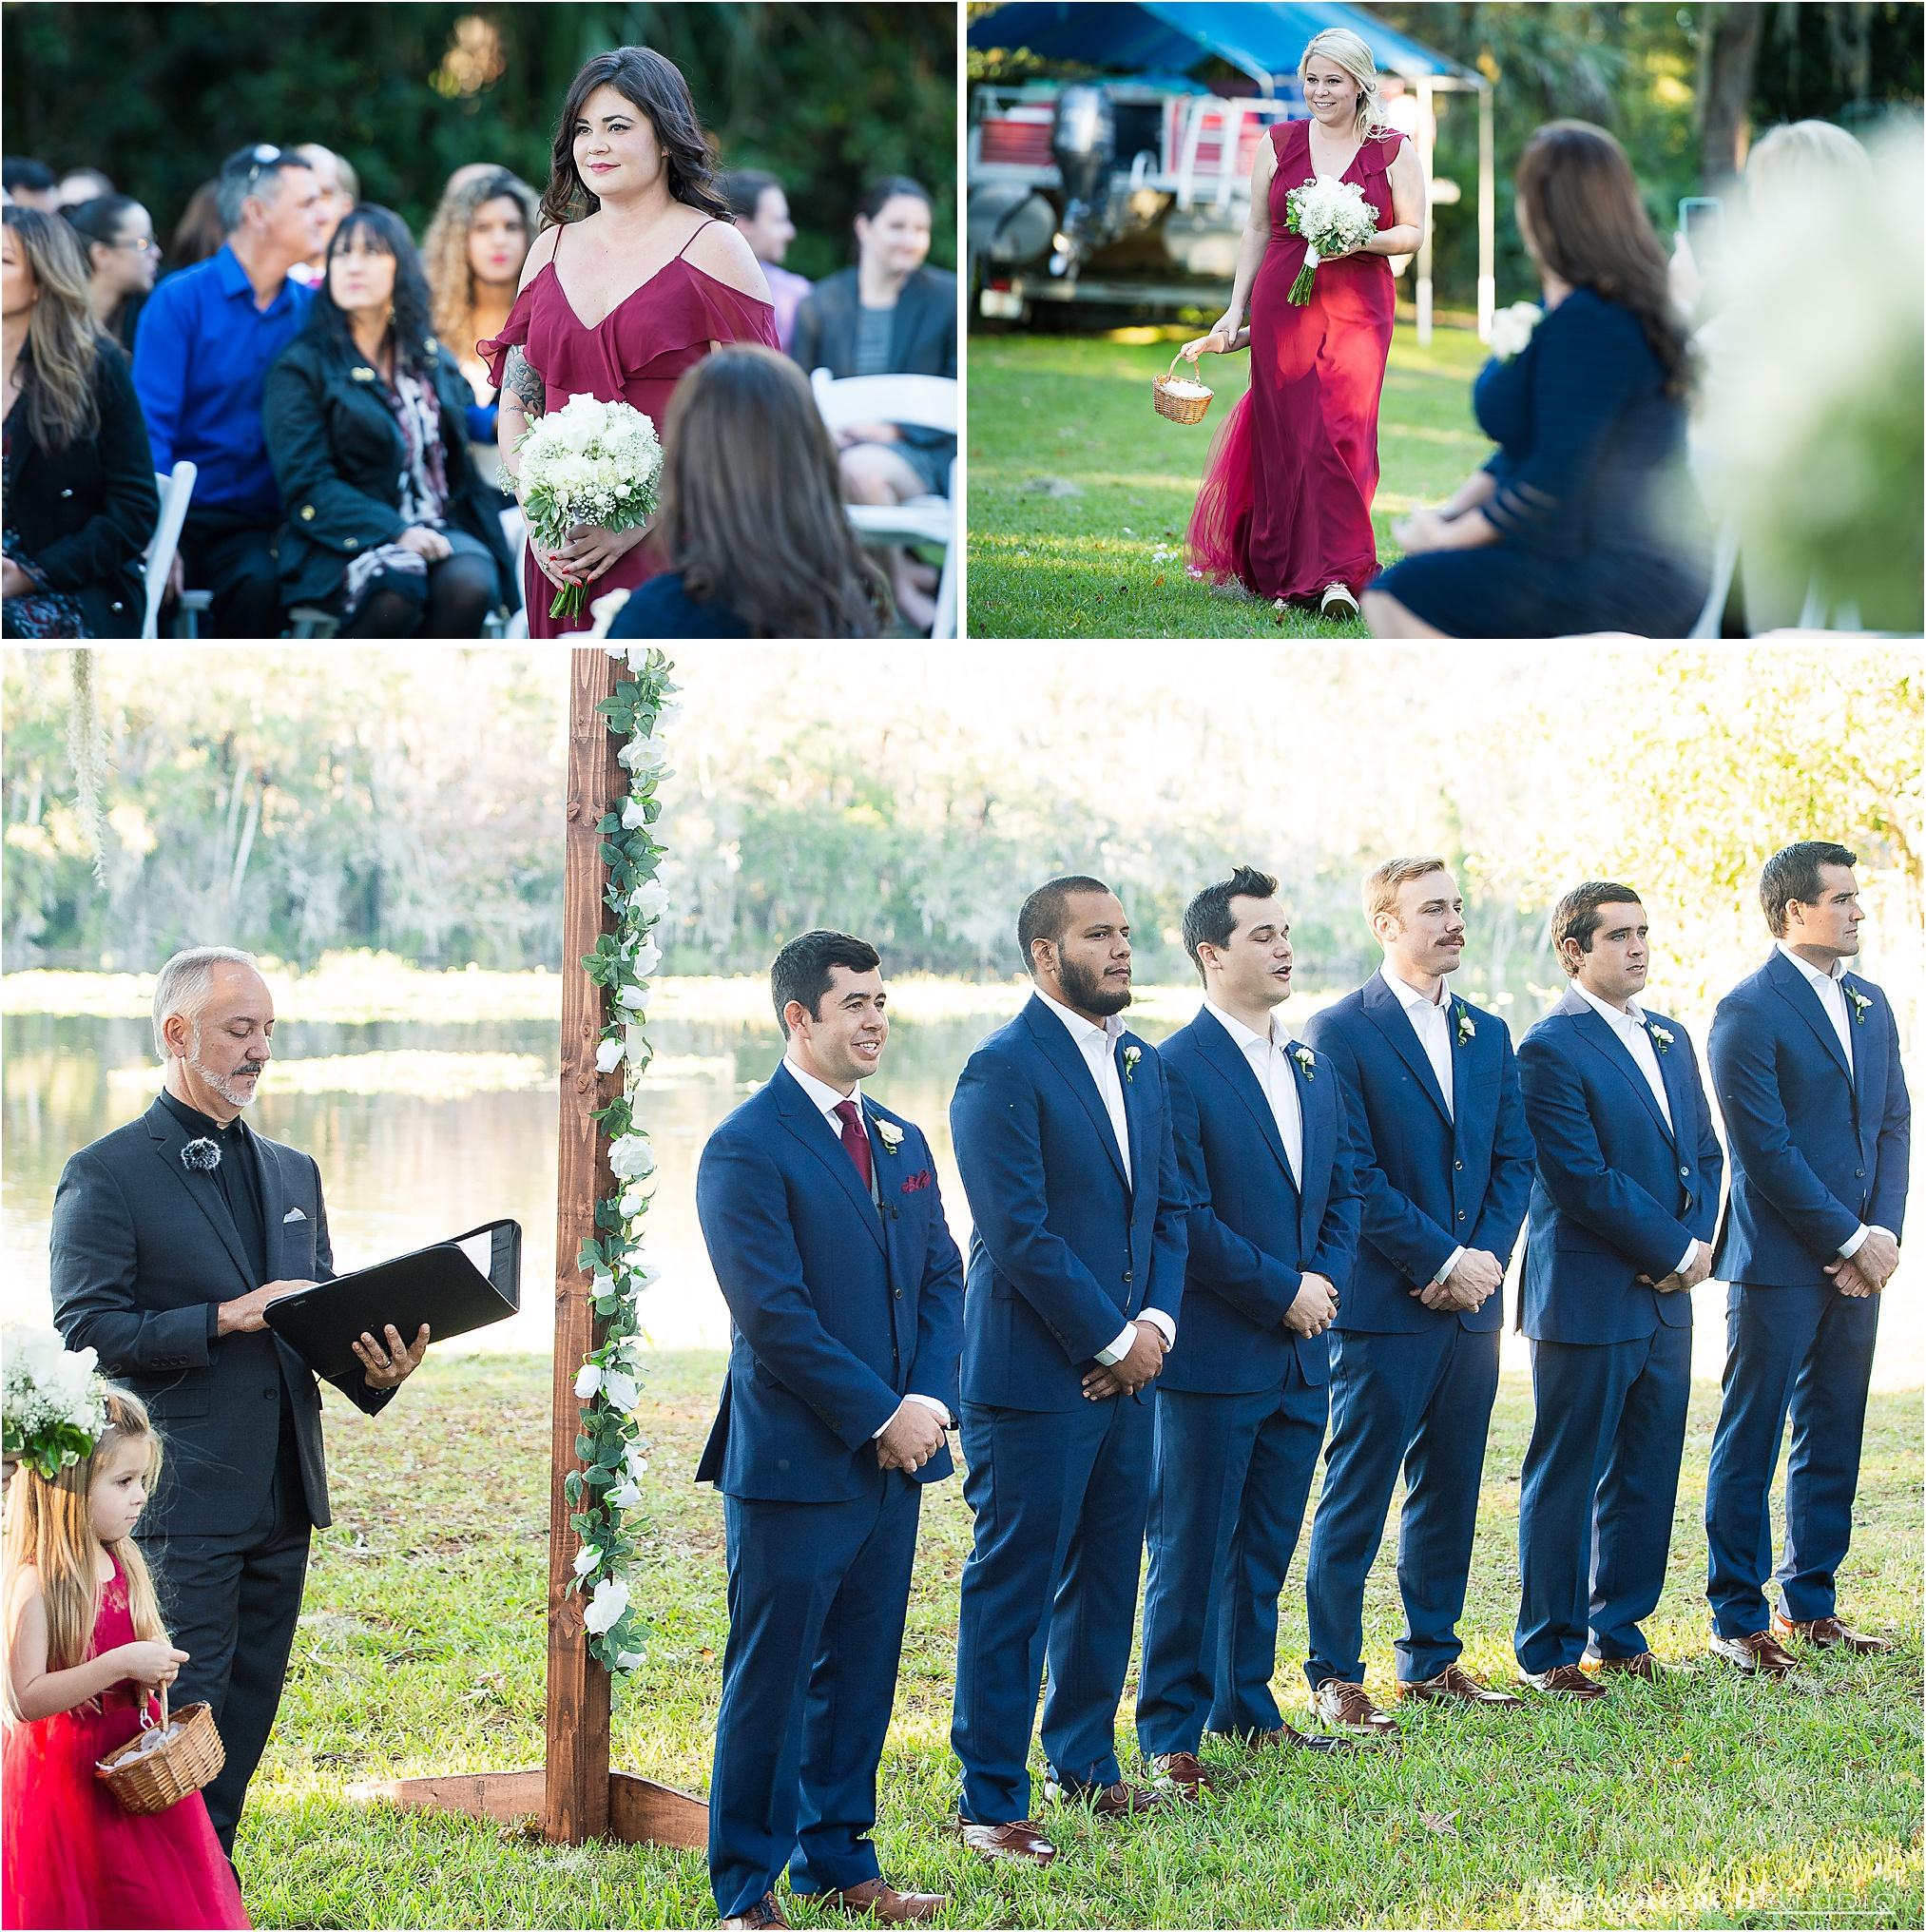 Wedding-photographer-in-sanford-florida-natural-wedding-036.jpg